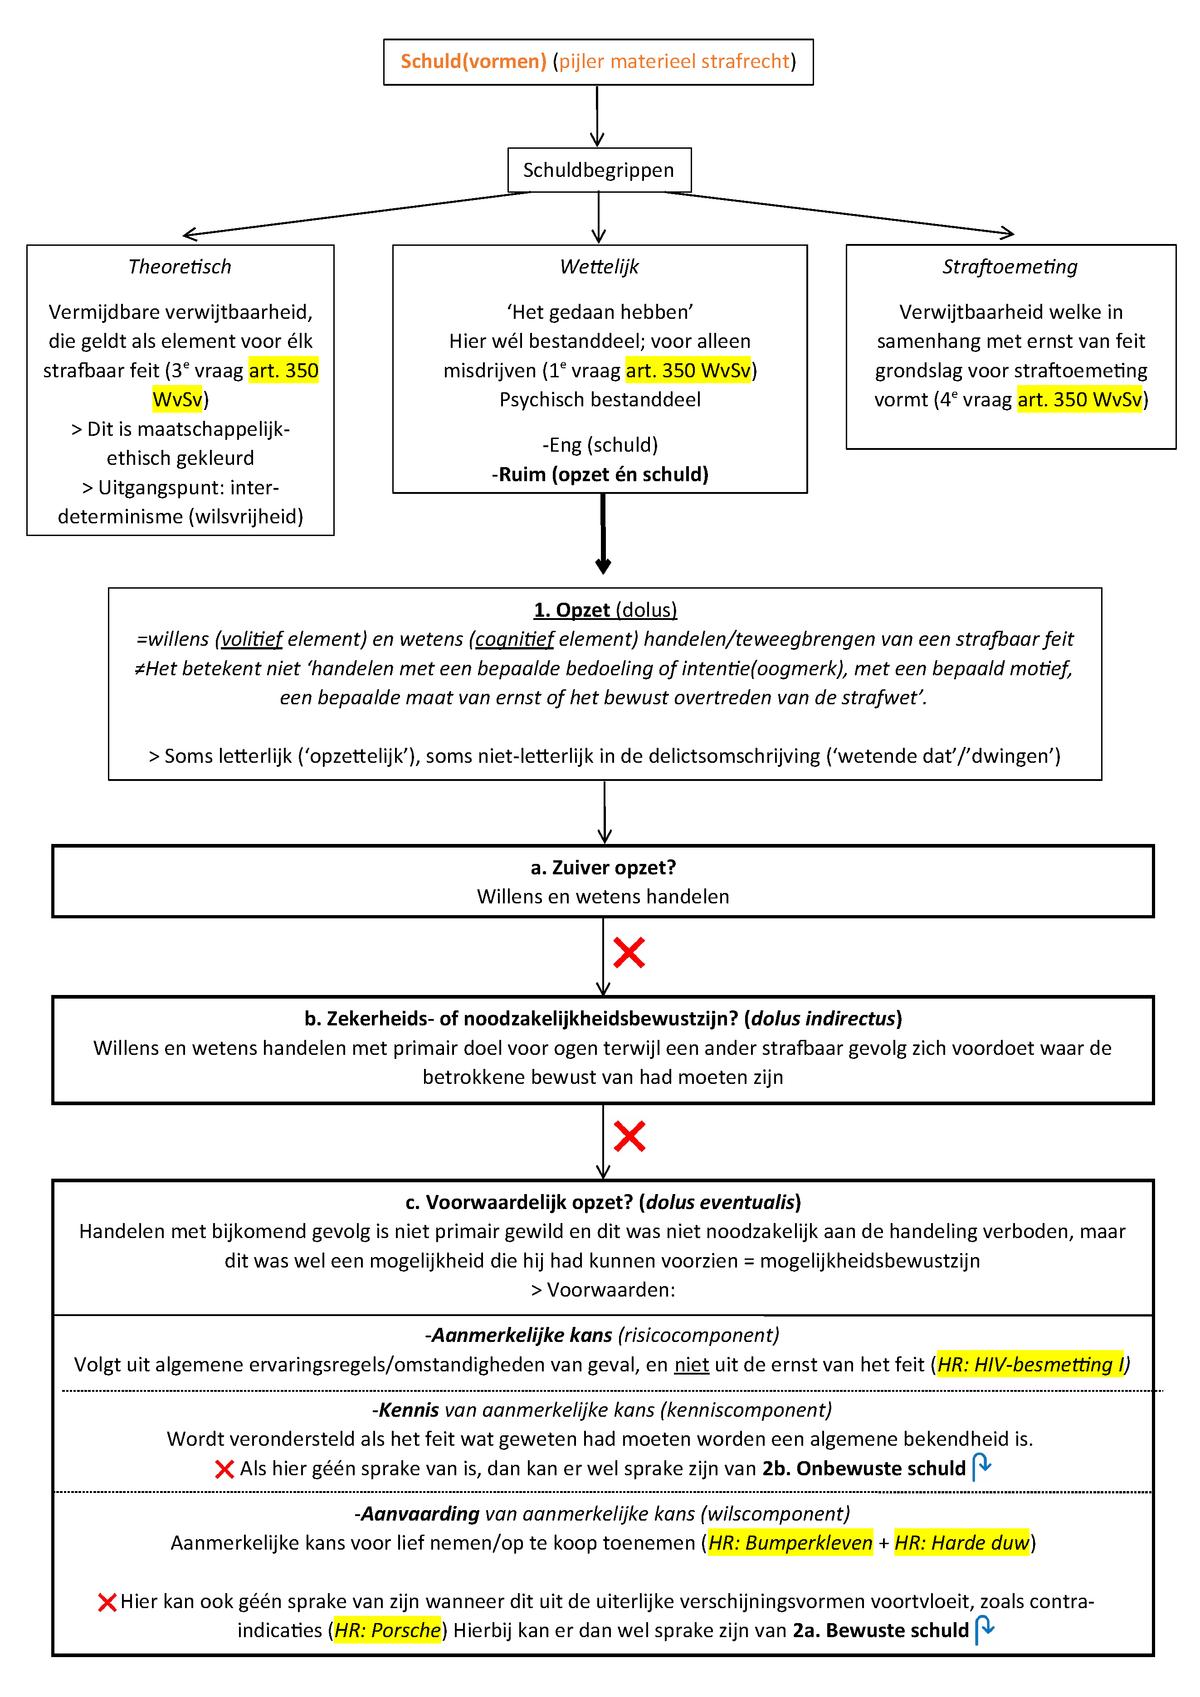 Schuldvormen Opzet En Culpa Materieel Strafrecht Rr203